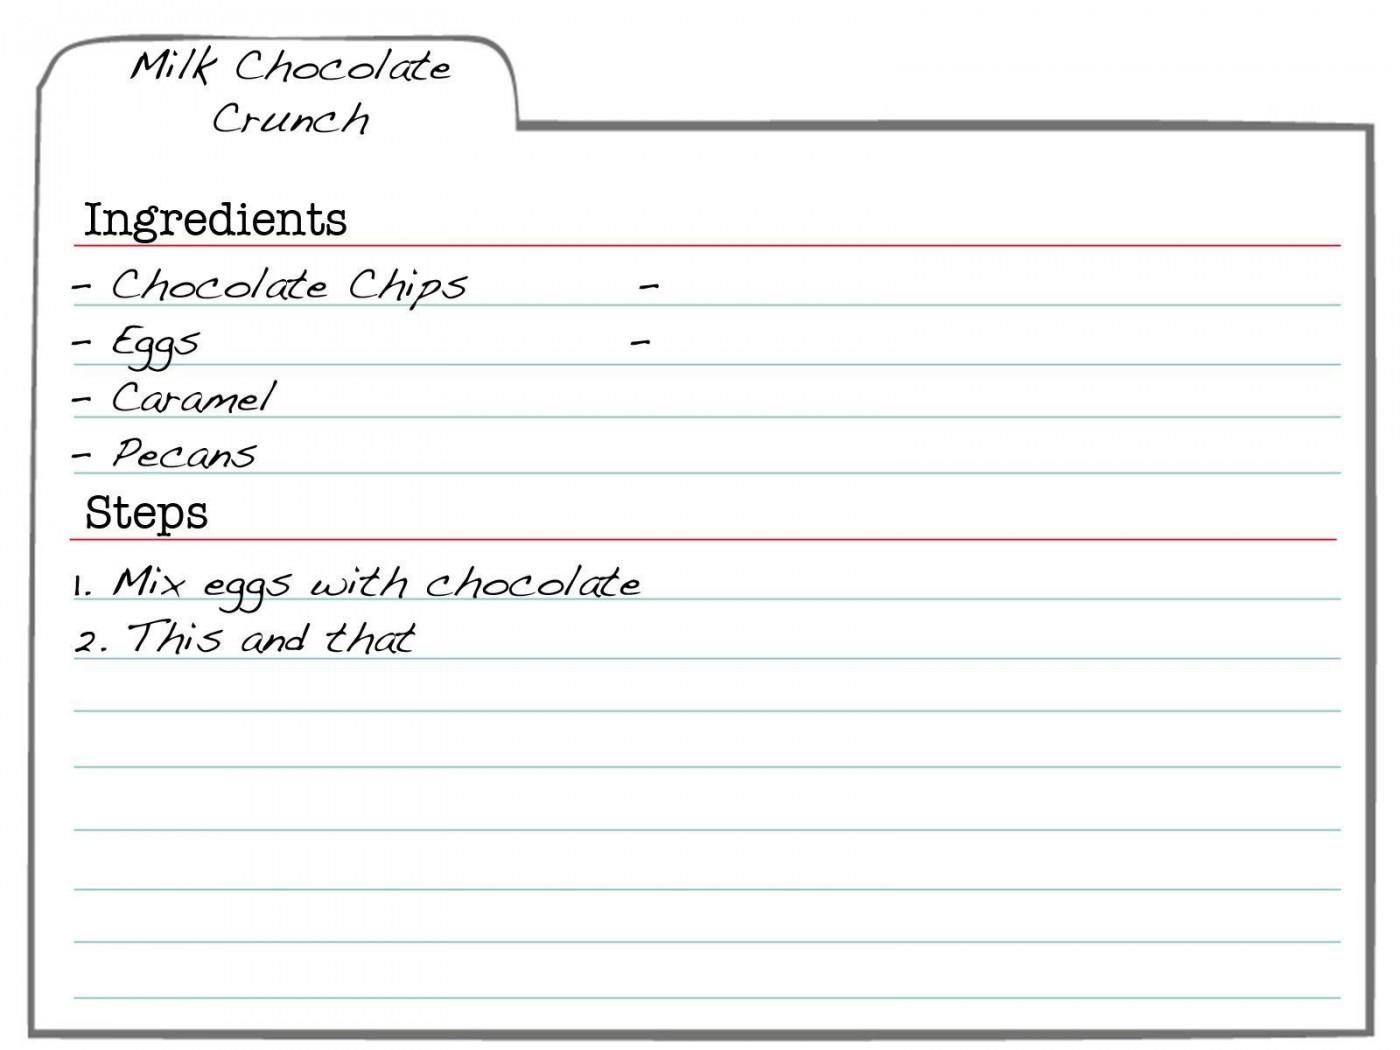 007 Formidable 3 X 5 Recipe Card Template Microsoft Word Idea 1400